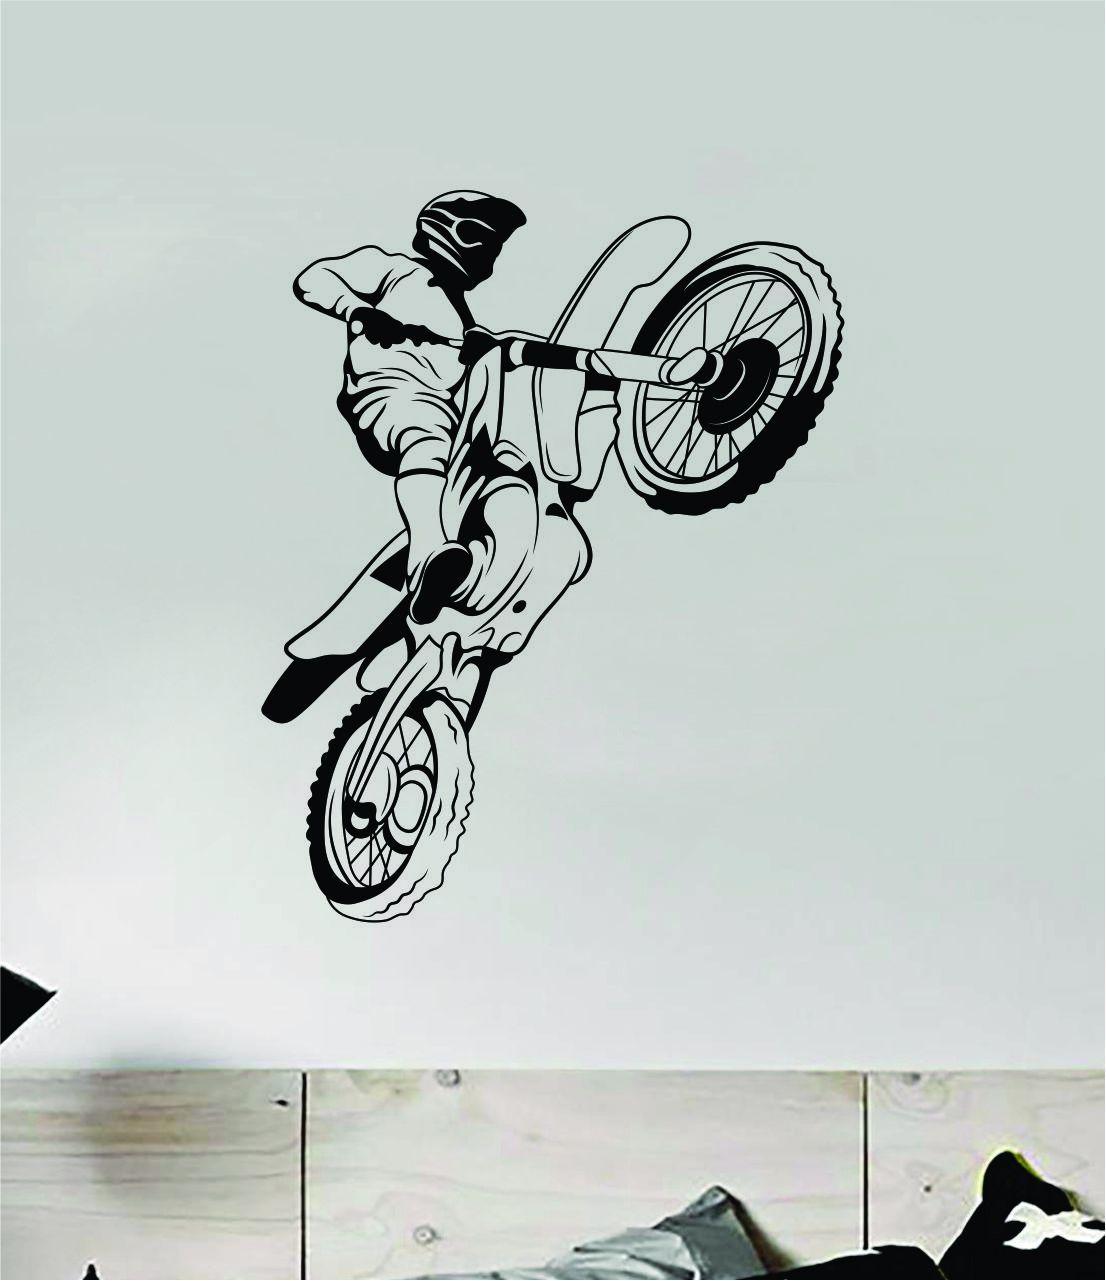 Dirtbiker v11 Wall Decal Sticker Bedroom Room Vinyl Art Home Decor Teen Boy Girl Sports Moto X Auto Rider Biker Race Dirt Brap Racing Dirtbike - orange